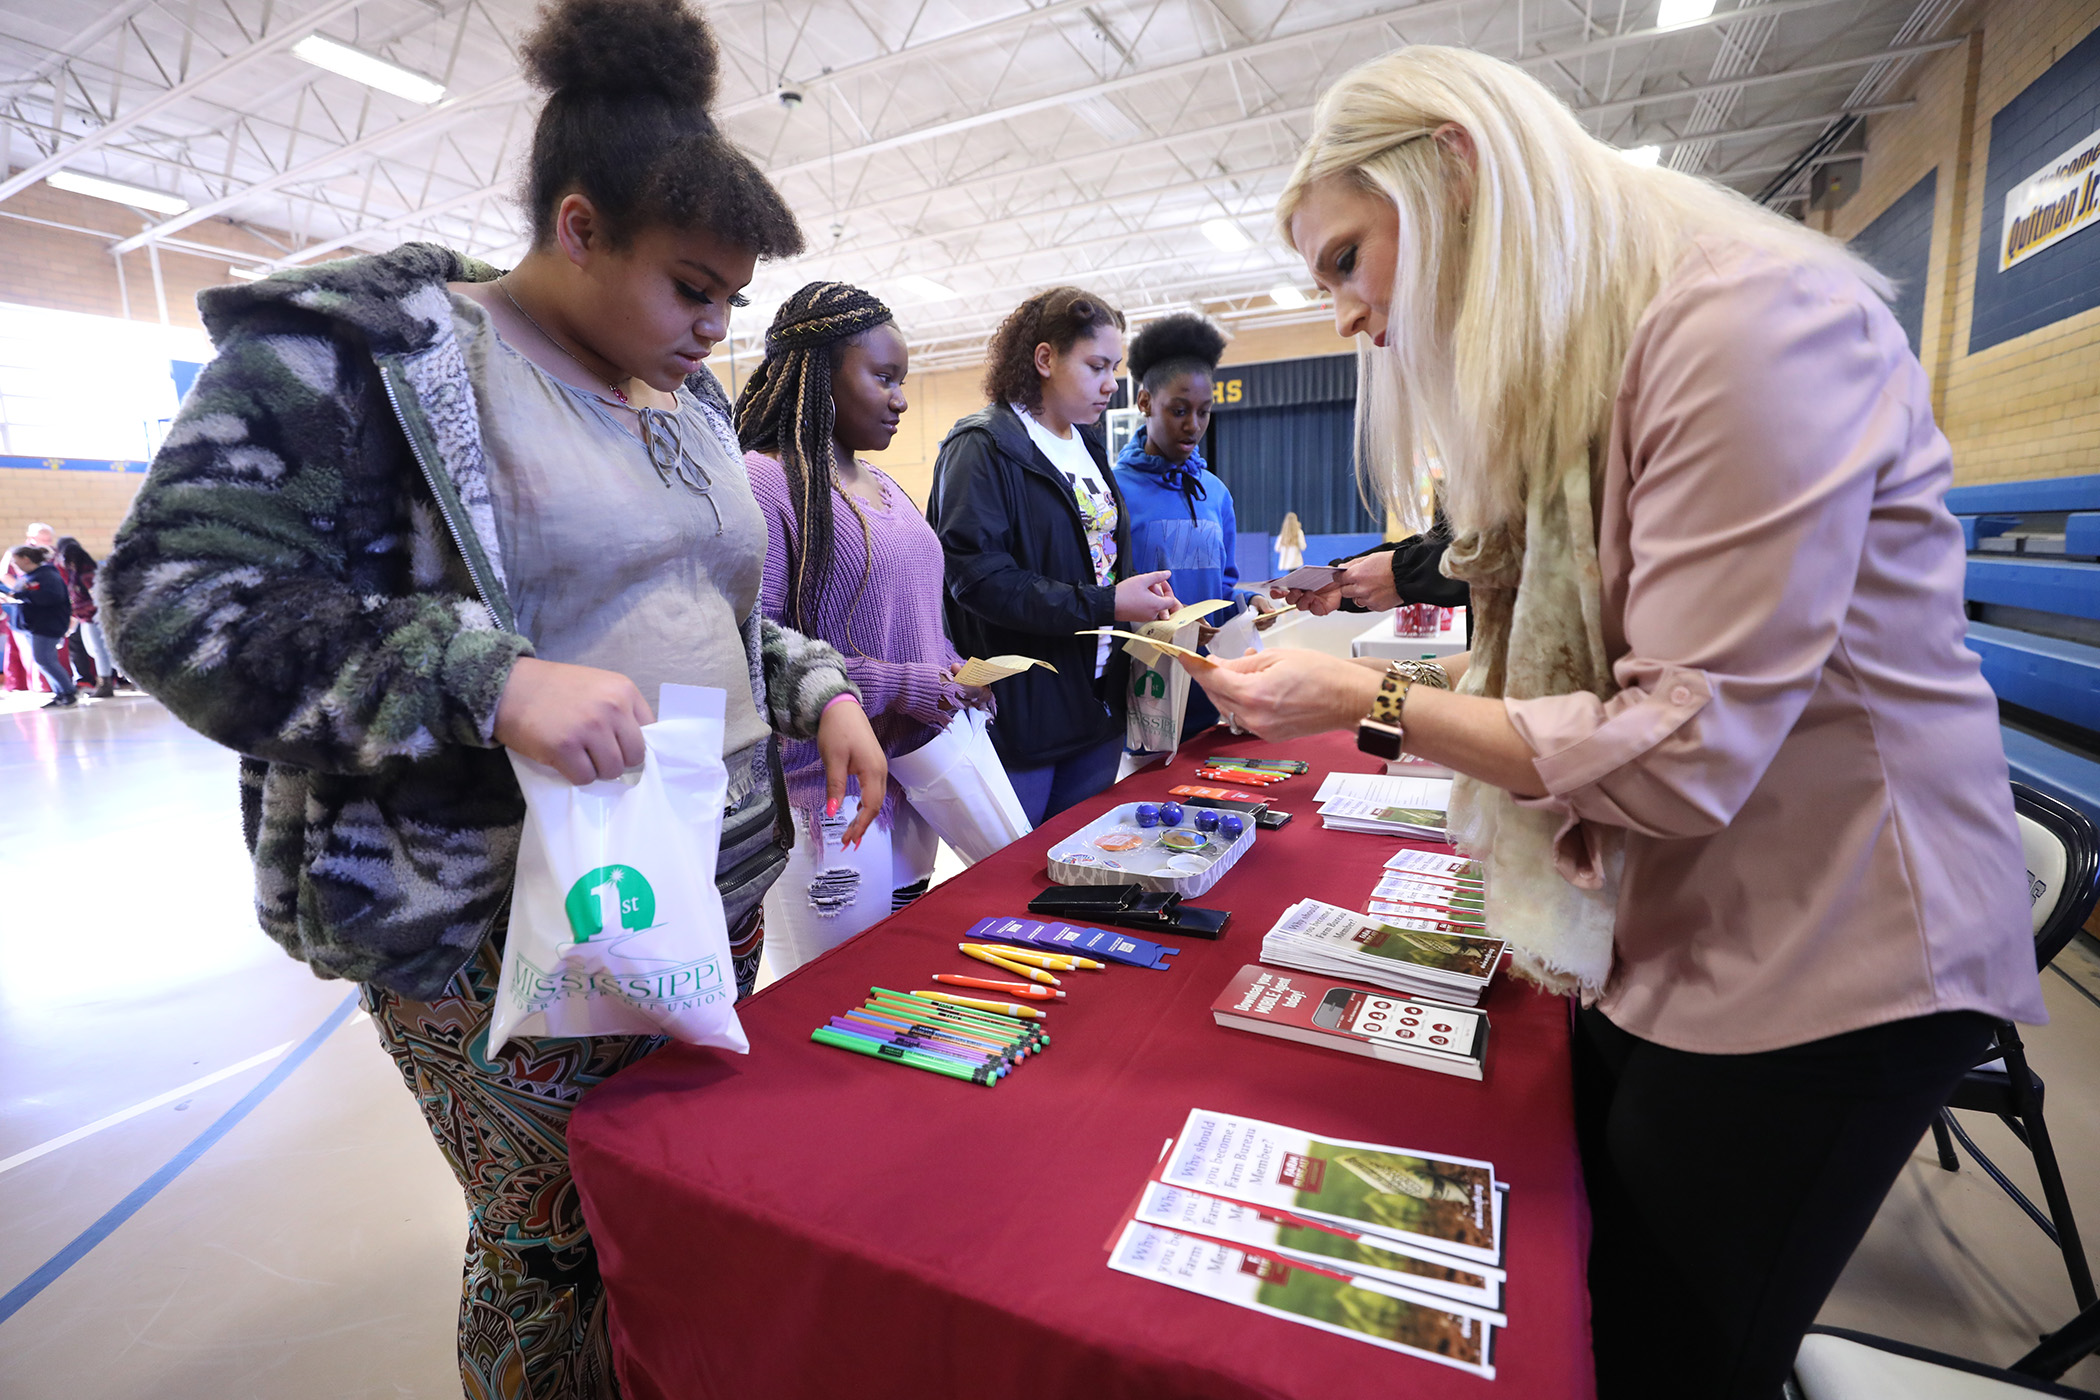 QJH has a college and career fair.